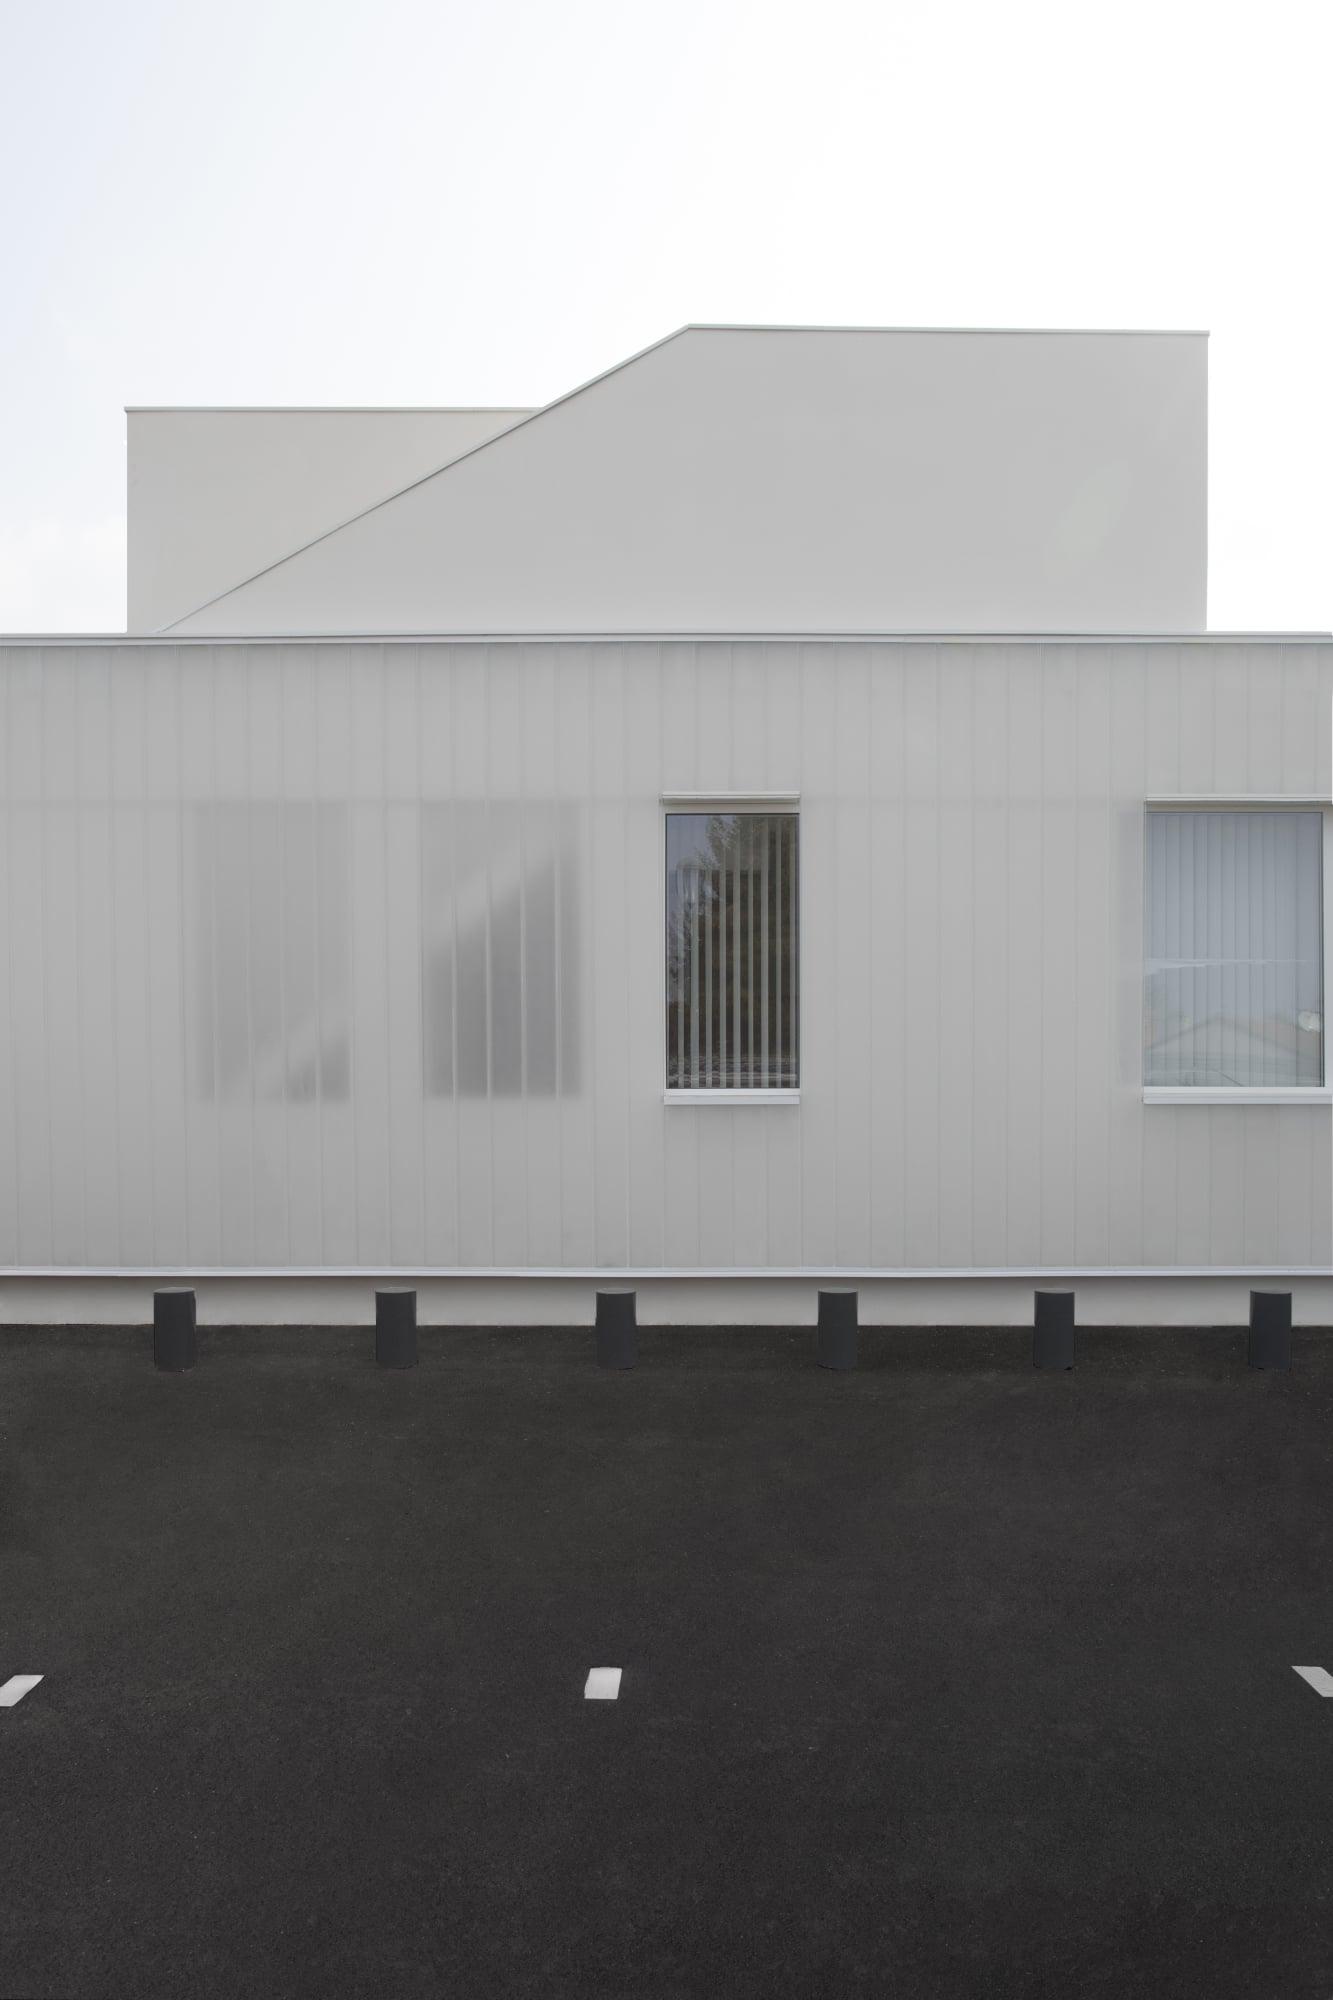 archaic_cilArchitecture_MaisonDeSanteSimoneVeil_15.jpg